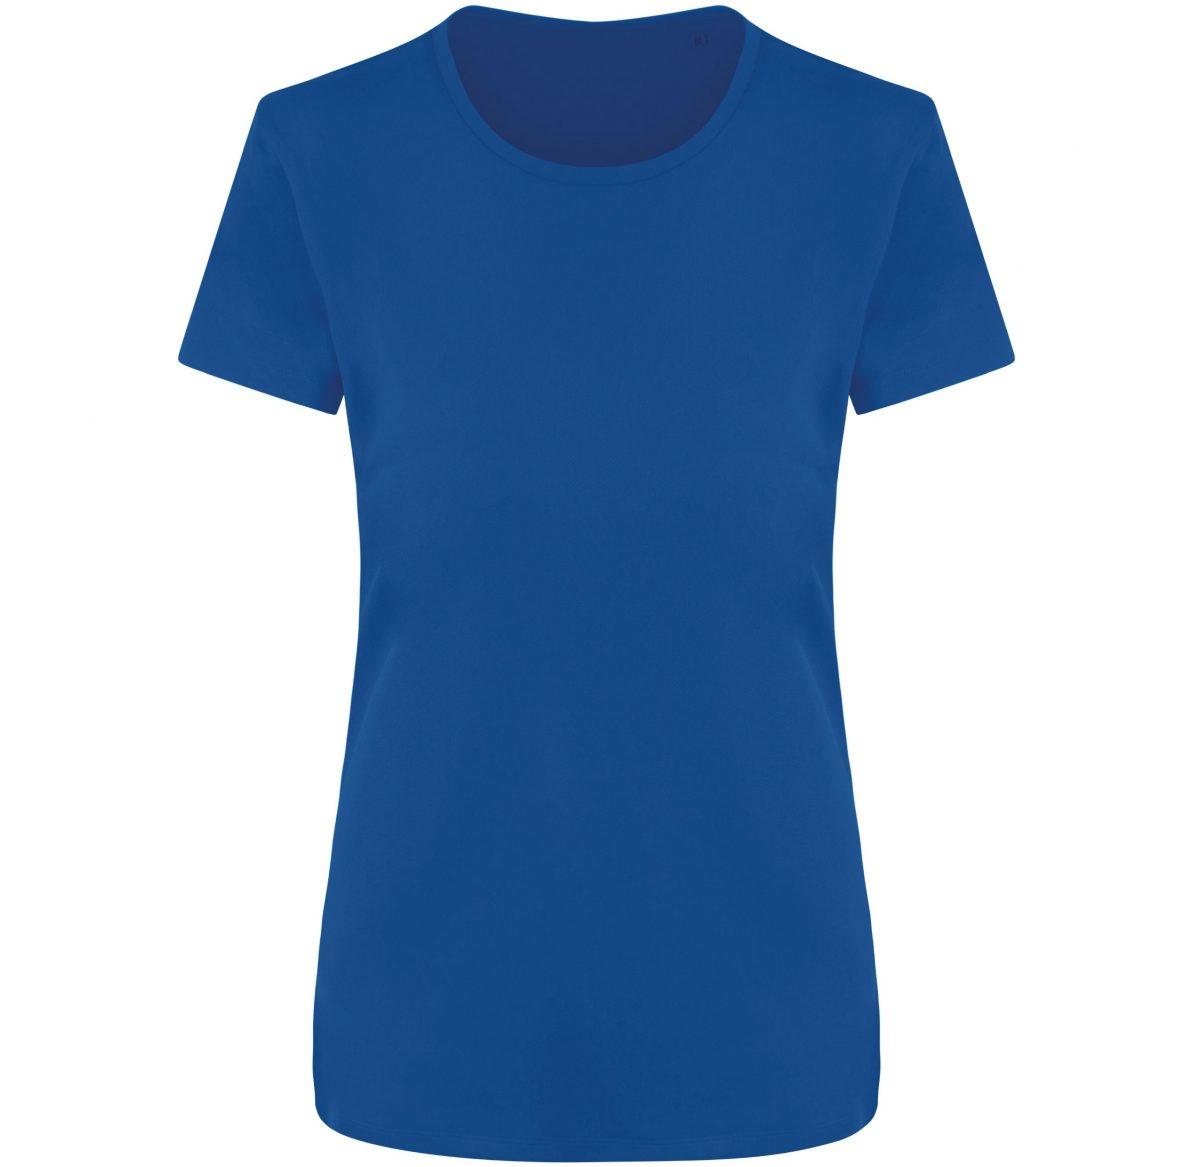 Tee-Shirt Femme Performance – Bleu royal